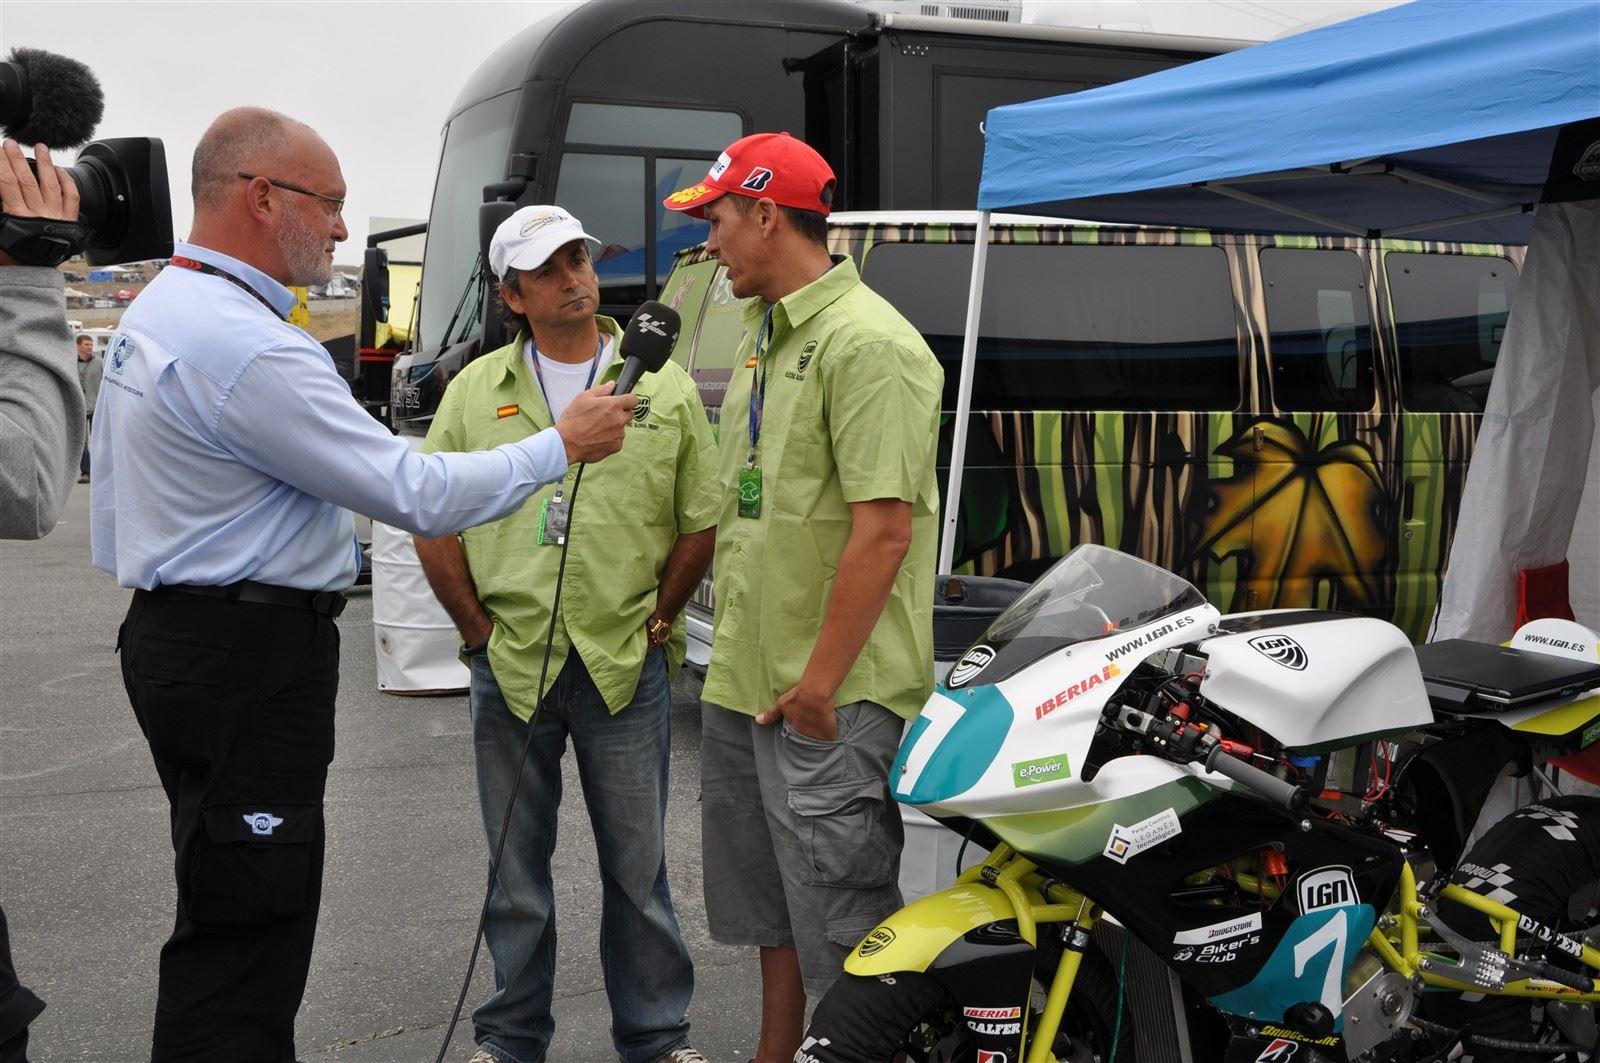 EP Designer Rolando Ortiz & LGN Team Pilot Marcelino Manzano being interviewed by FIM at the 2011 MotoGP Laguna Seca.